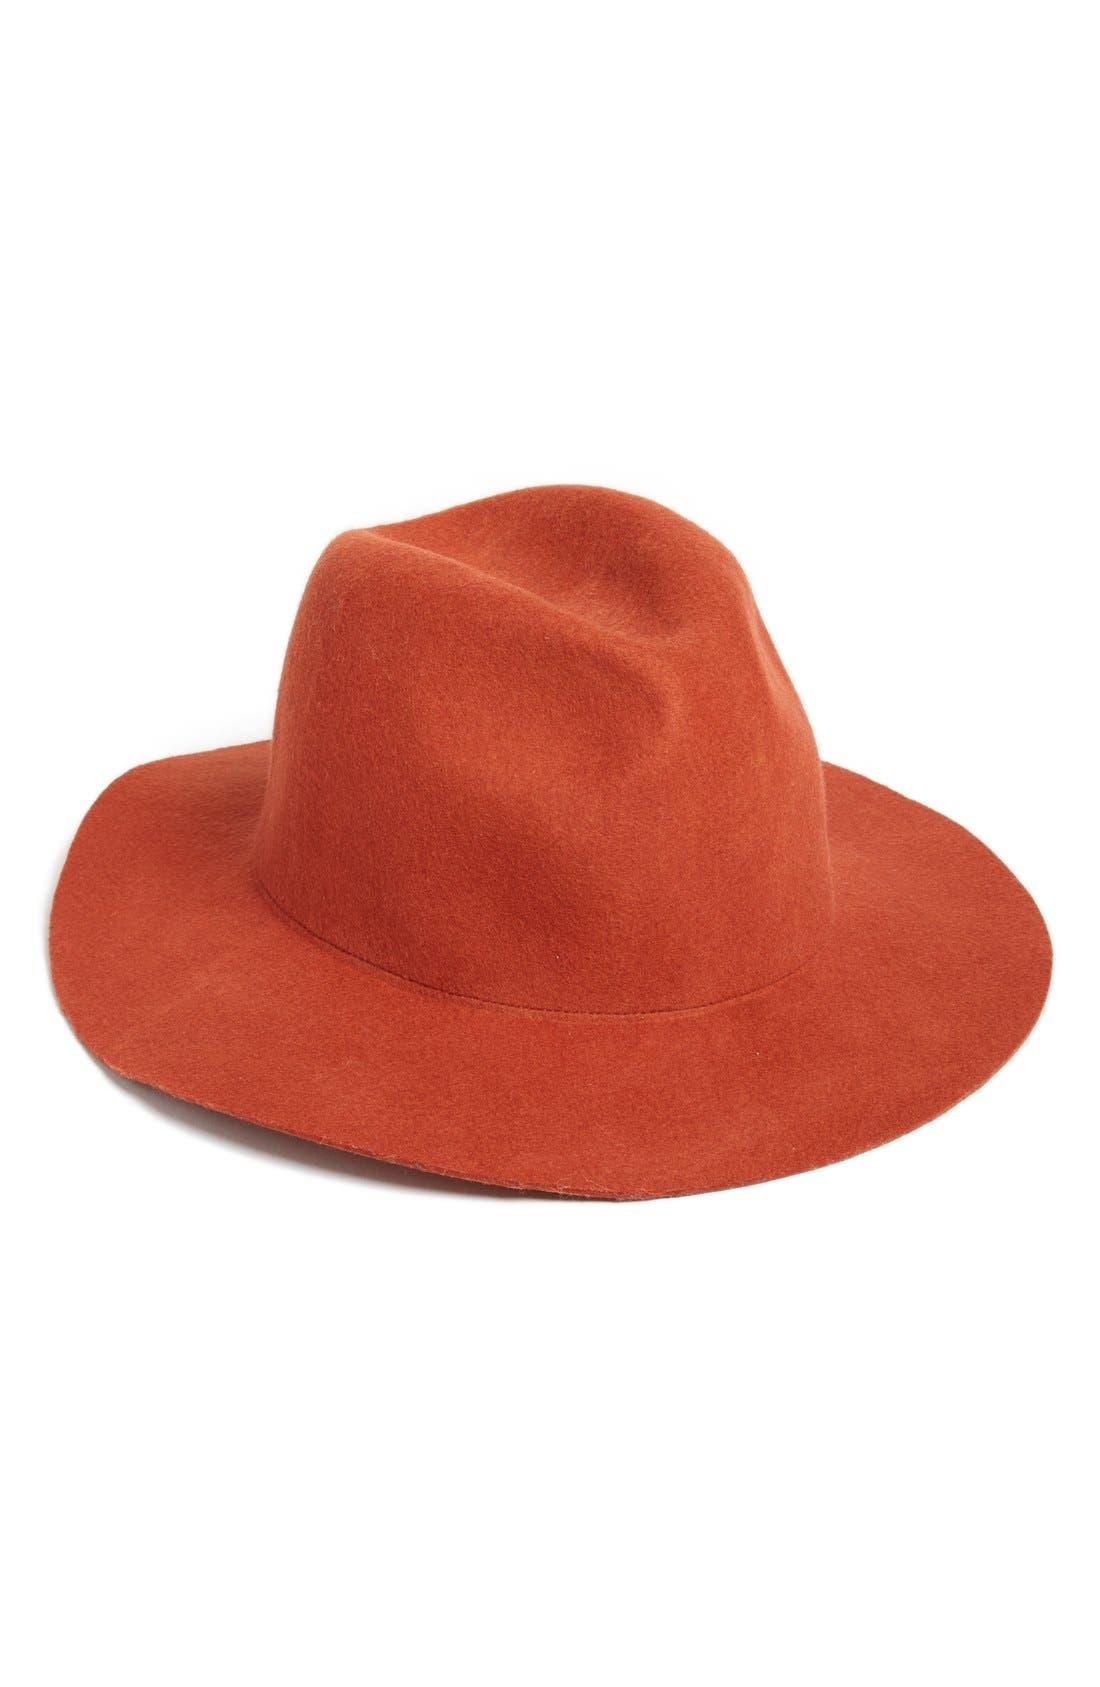 Alternate Image 1 Selected - Rhythm Wool Hat